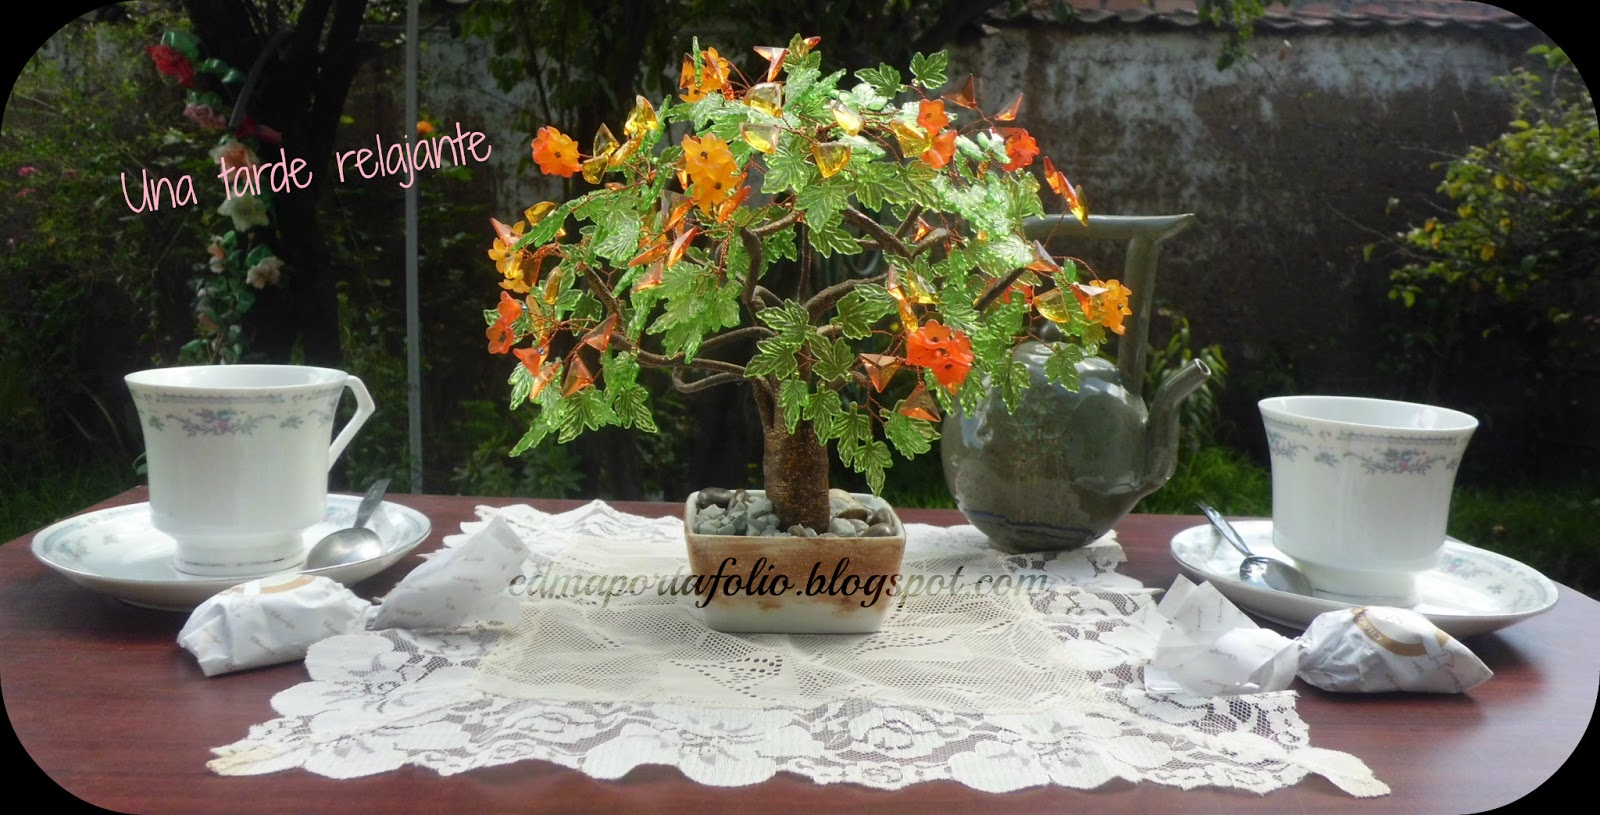 El portafolio de edma t con el bonsai de la alegr a - Mesas para bonsai ...